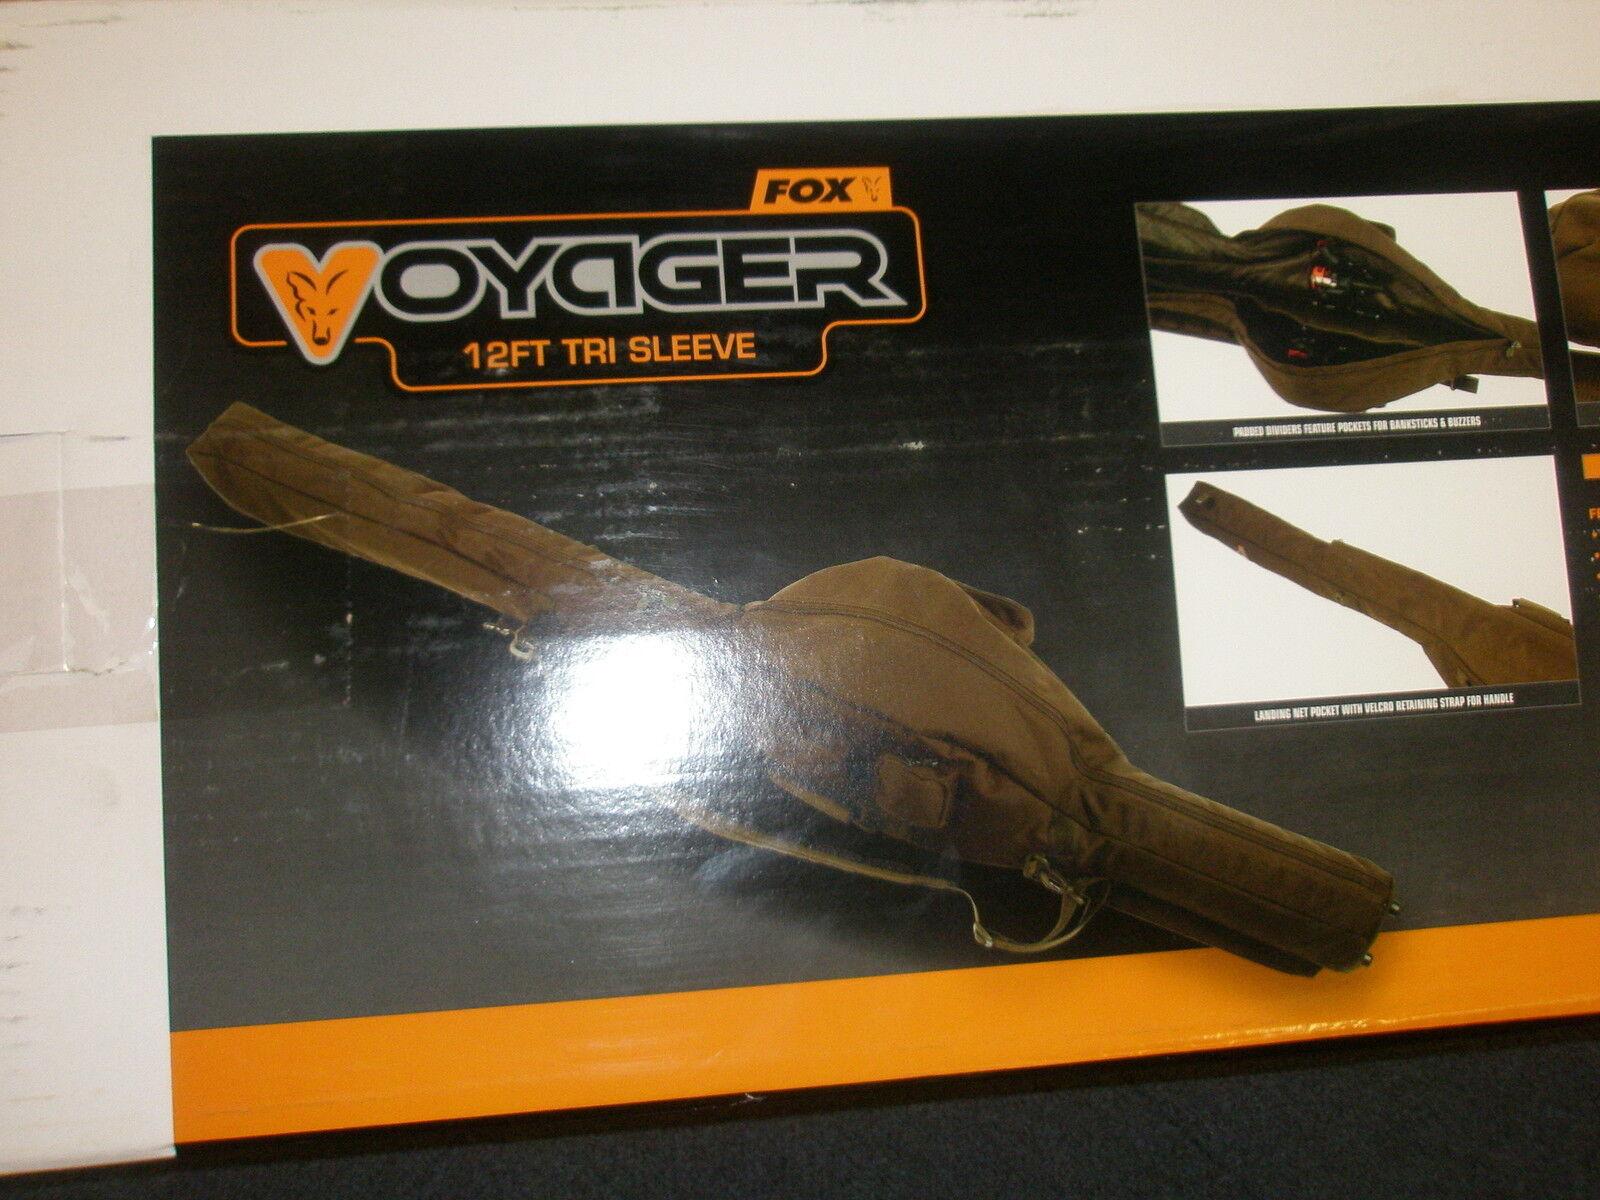 Fox Voyager Tri Manga 12 ft (approx. 3.66 m) Bolsa de viaje varilla Cochepa aparejos de pesca